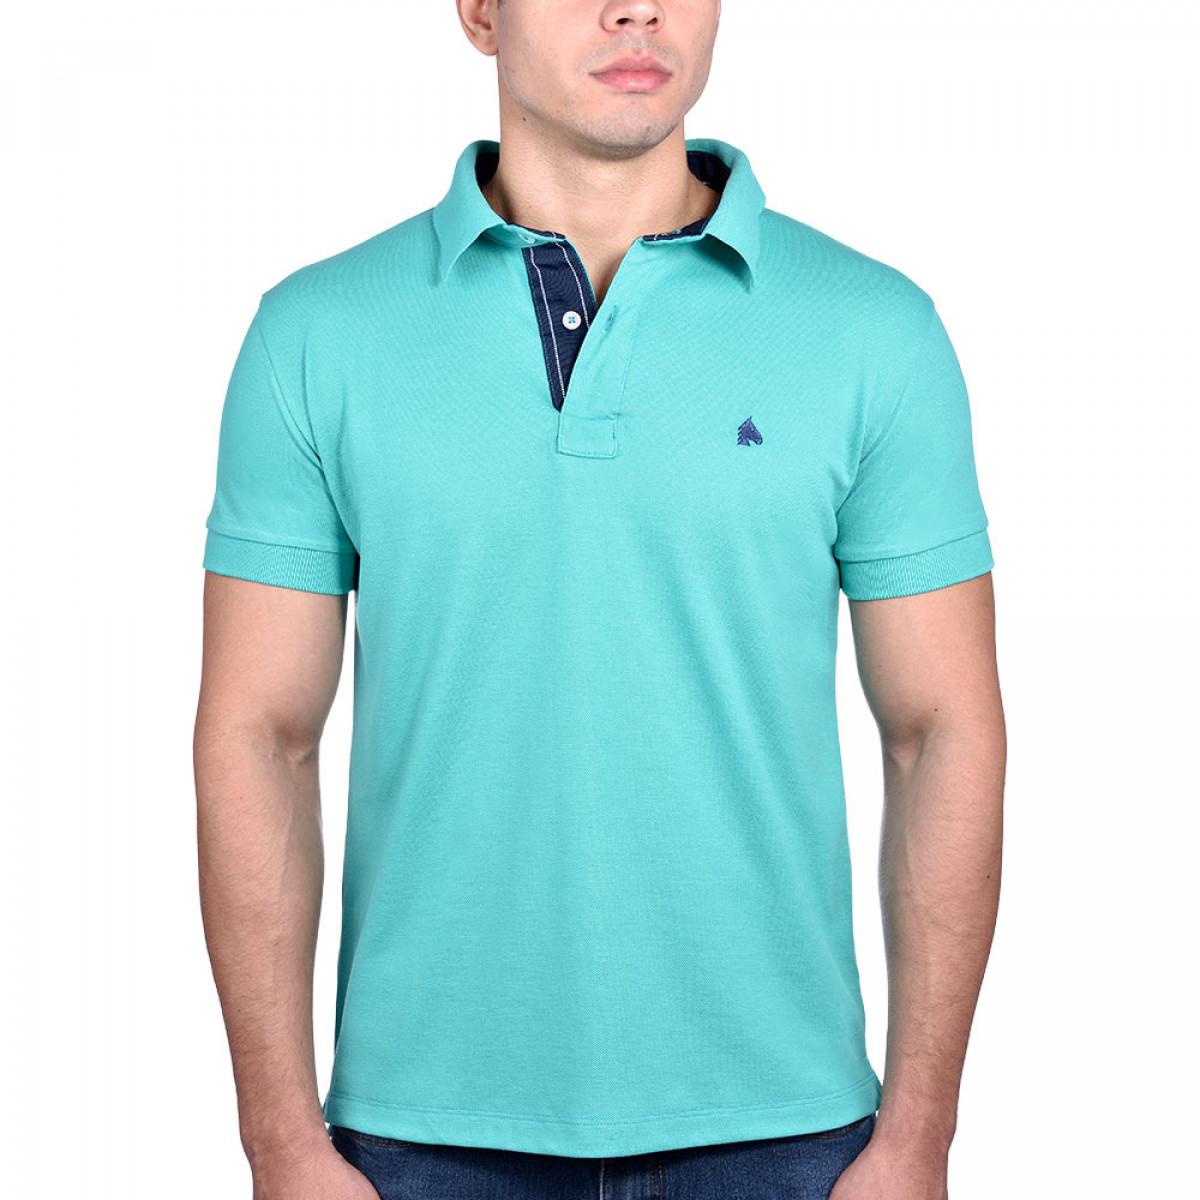 c18f0b8831 Camisa Polo BF   MS Verde Esmeralda - BF   MS